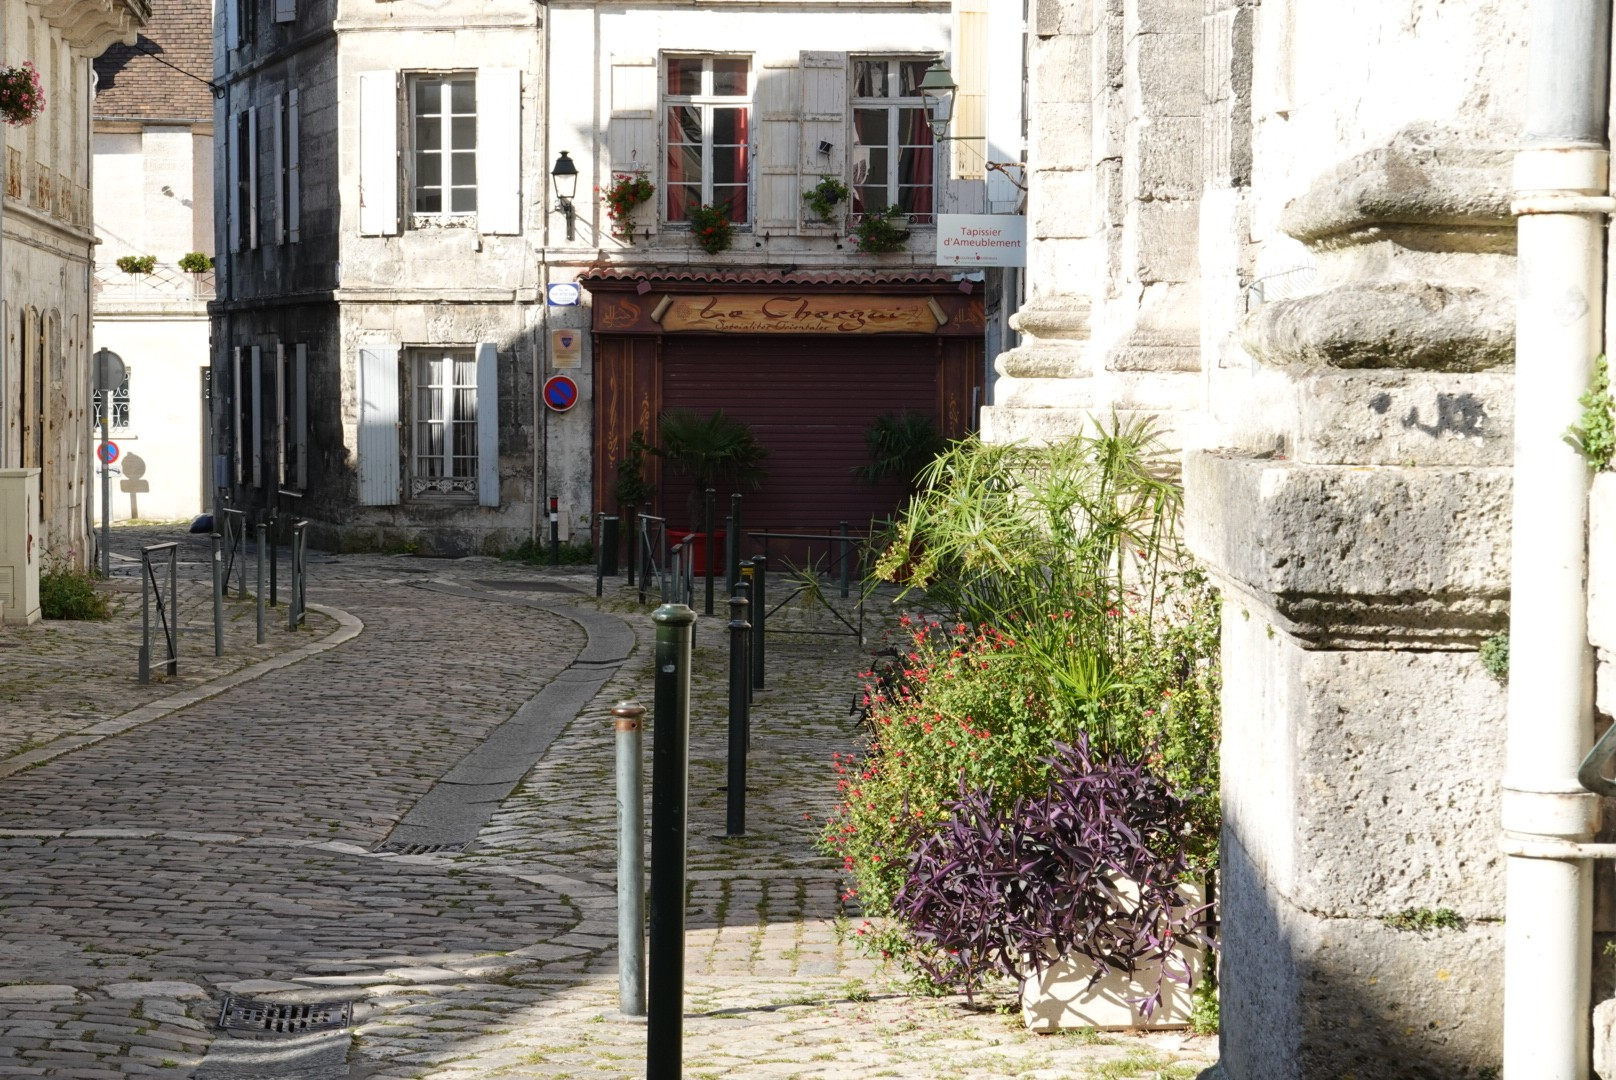 5 septembre : Angoulême